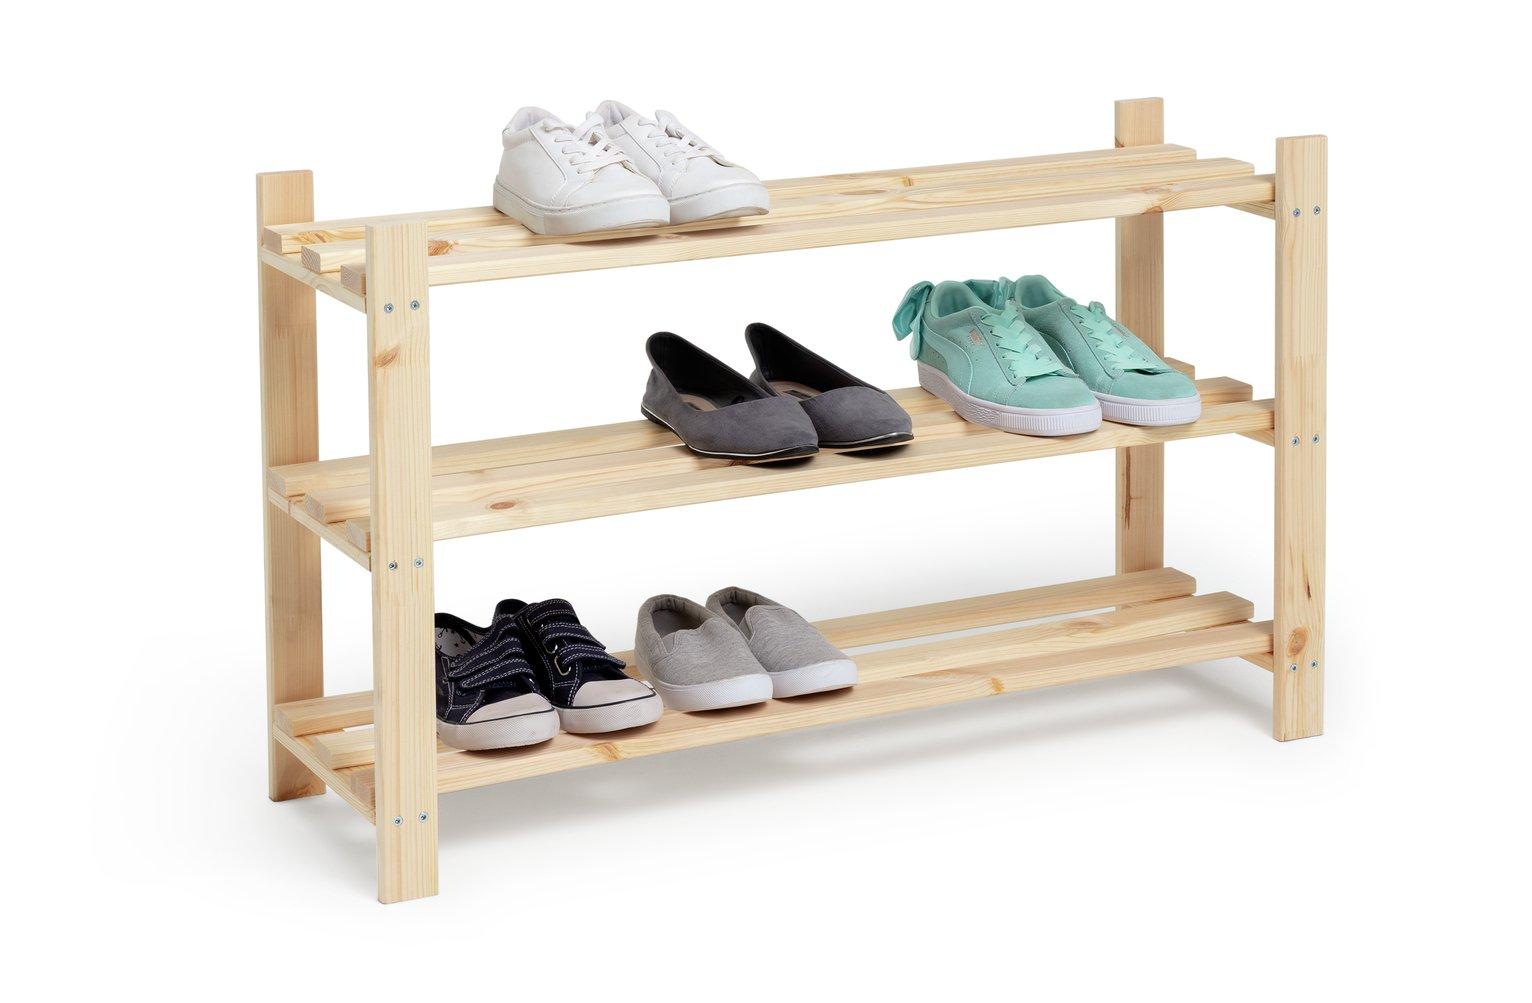 Merveilleux Argos Home 3 Shelf Shoe Storage Rack   Solid Unfinished Pine